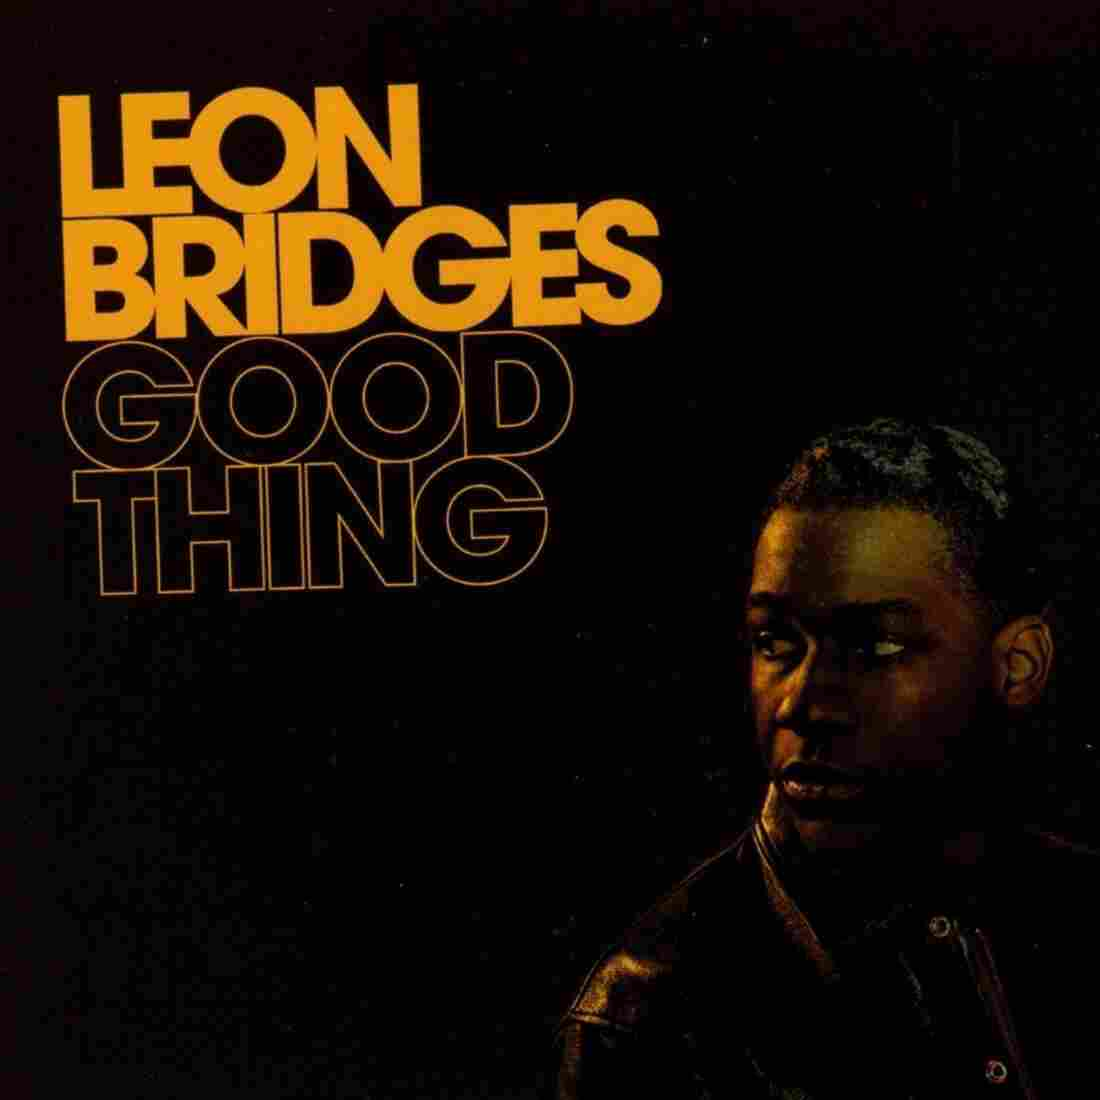 LeonBridges, Good Thing